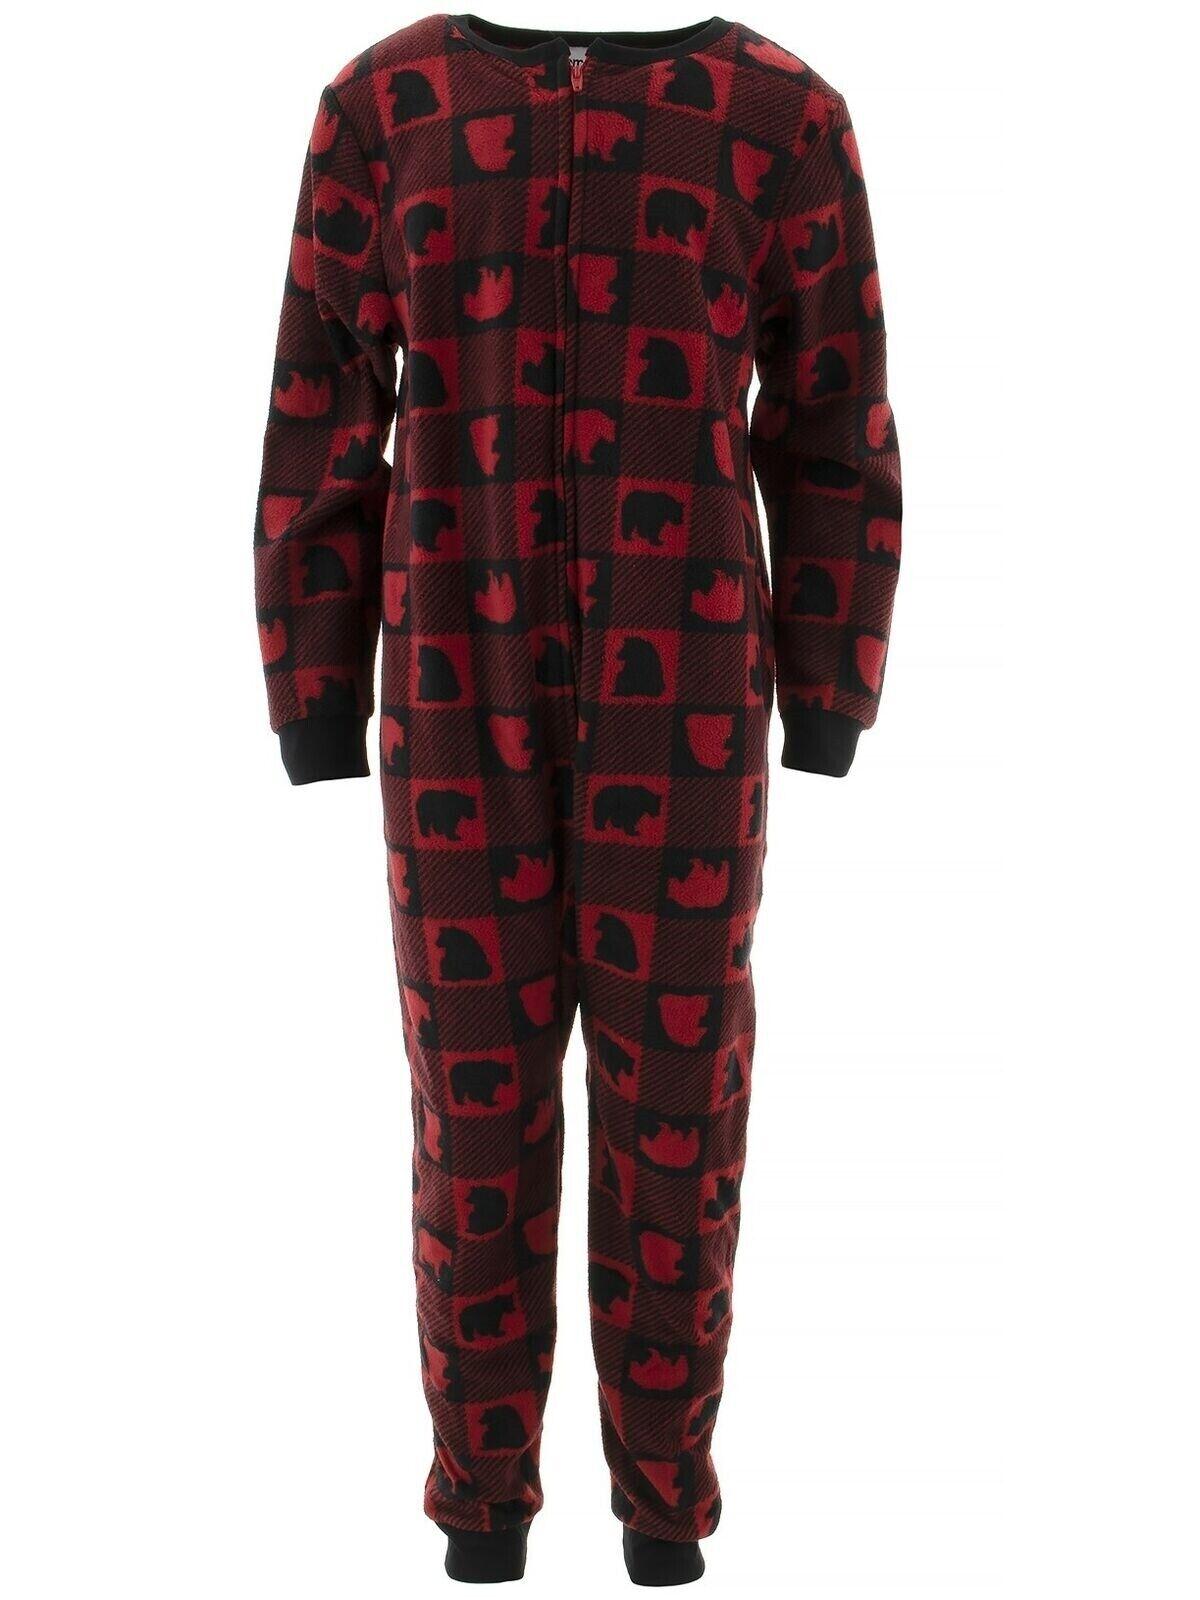 Komar Kids Boys Bear Red Plaid Fleece Blanket Sleeper One-Pi